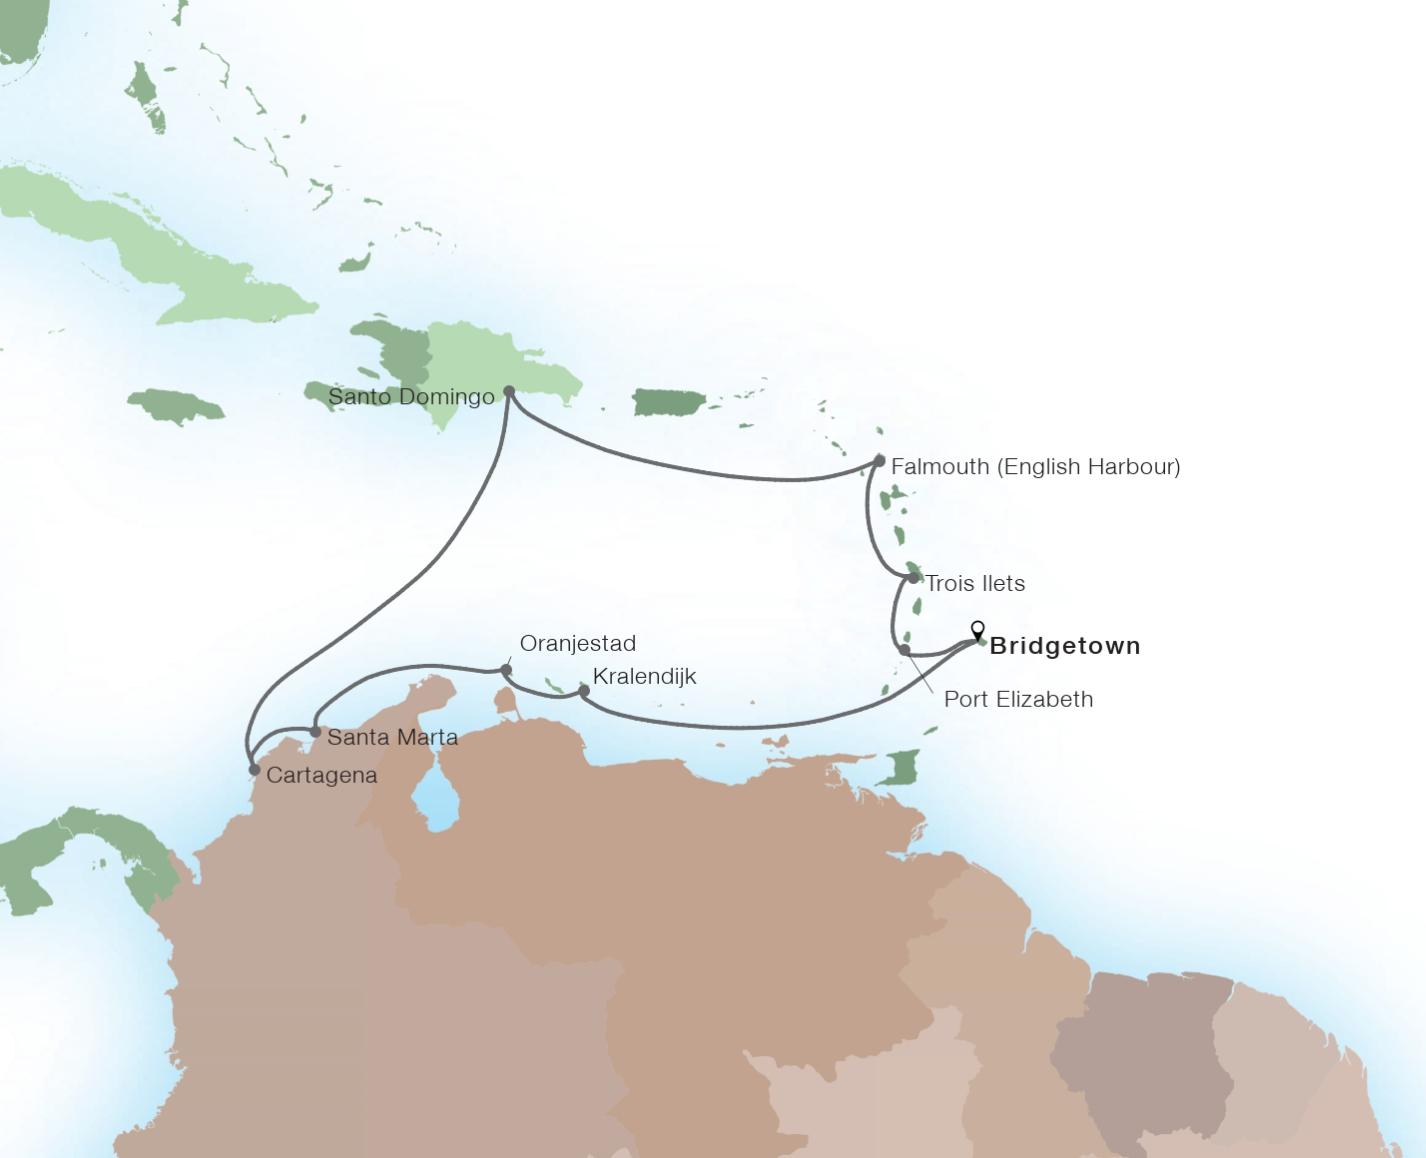 13-Day Panama Canal & Inca Gold - SEABOURN QUESTMiami, Florida, U.S. to Callao (Lima), Peru